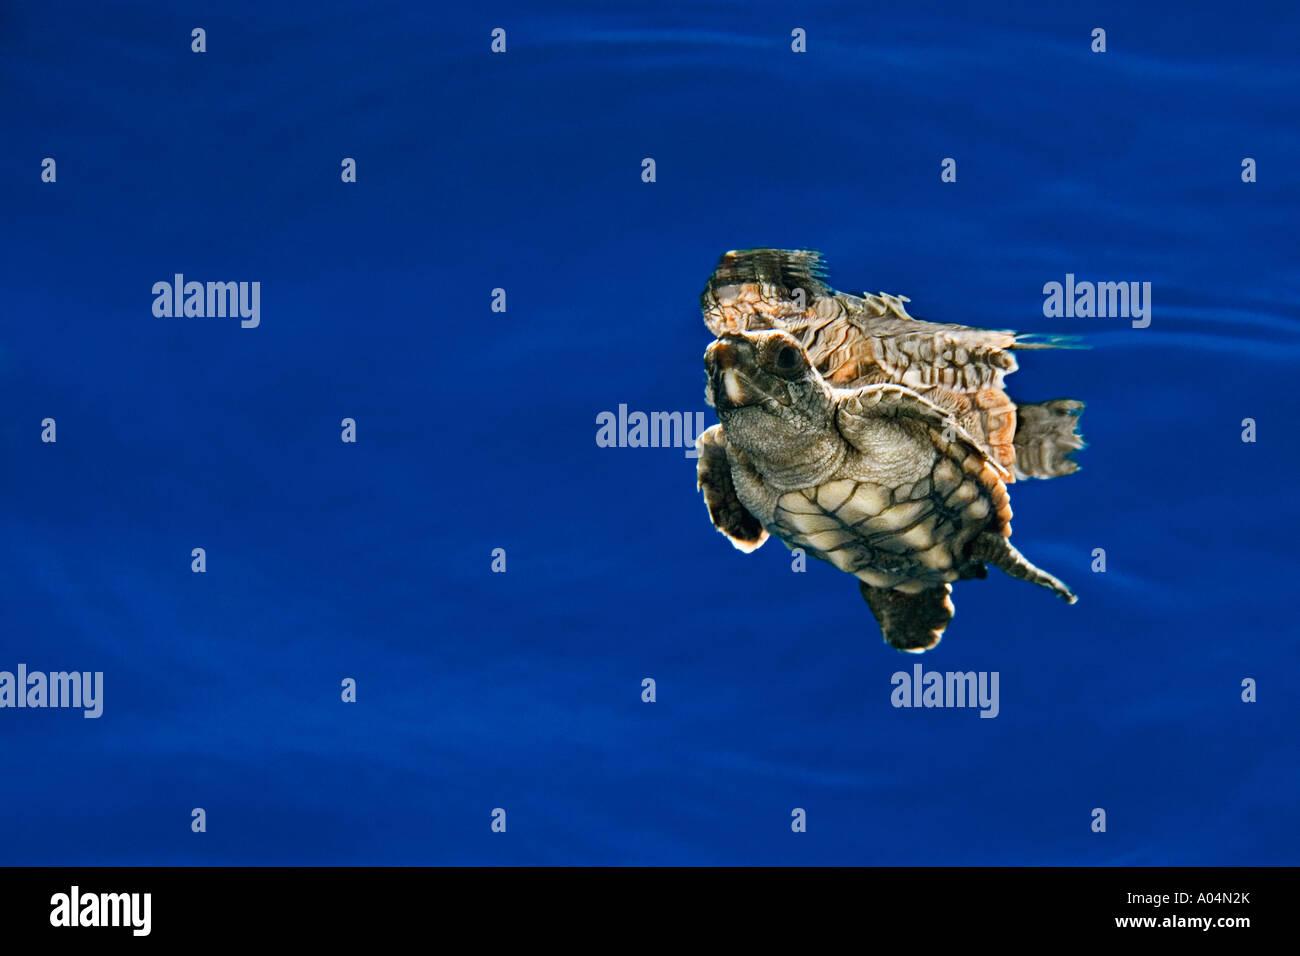 Loggerhead sea turtle hatchling, Caretta caretta, in open water, Sargasso Sea, North Atlantic Ocean - Stock Image